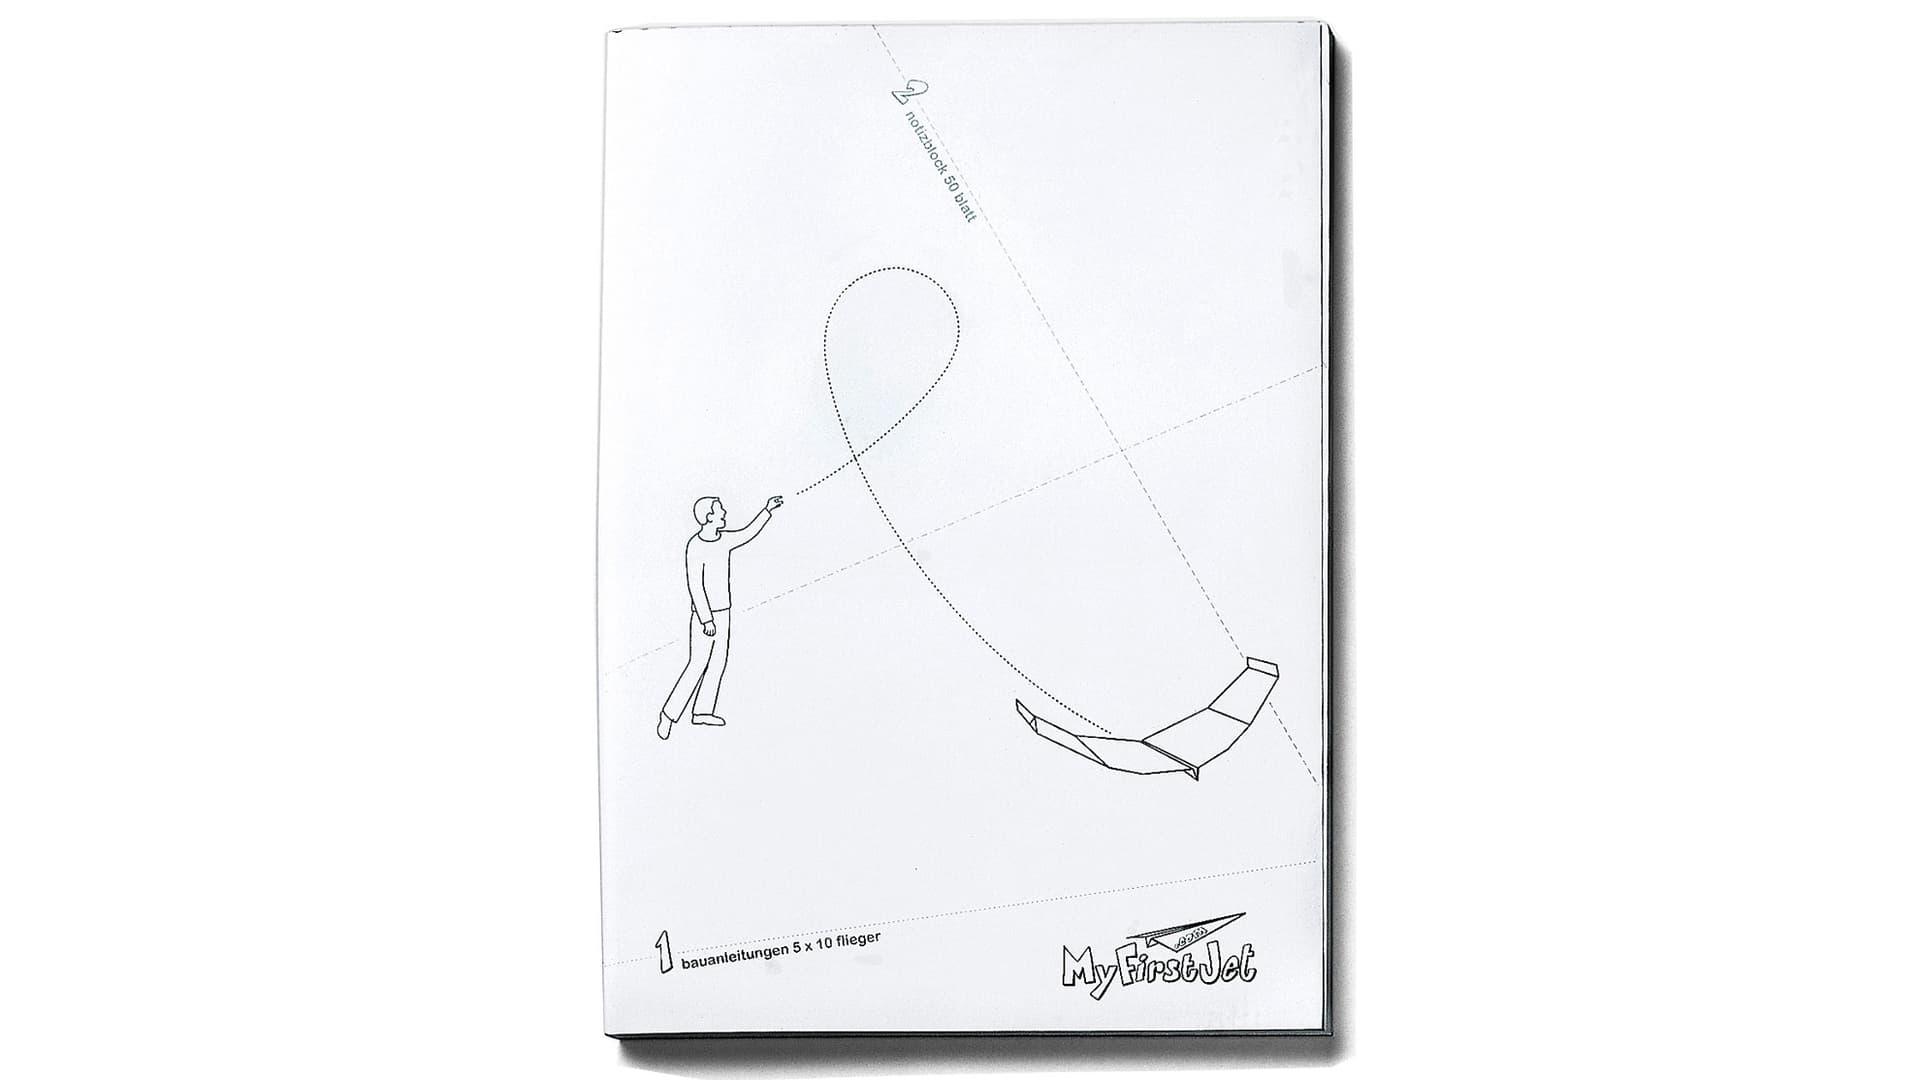 Notizbuch Papierflieger